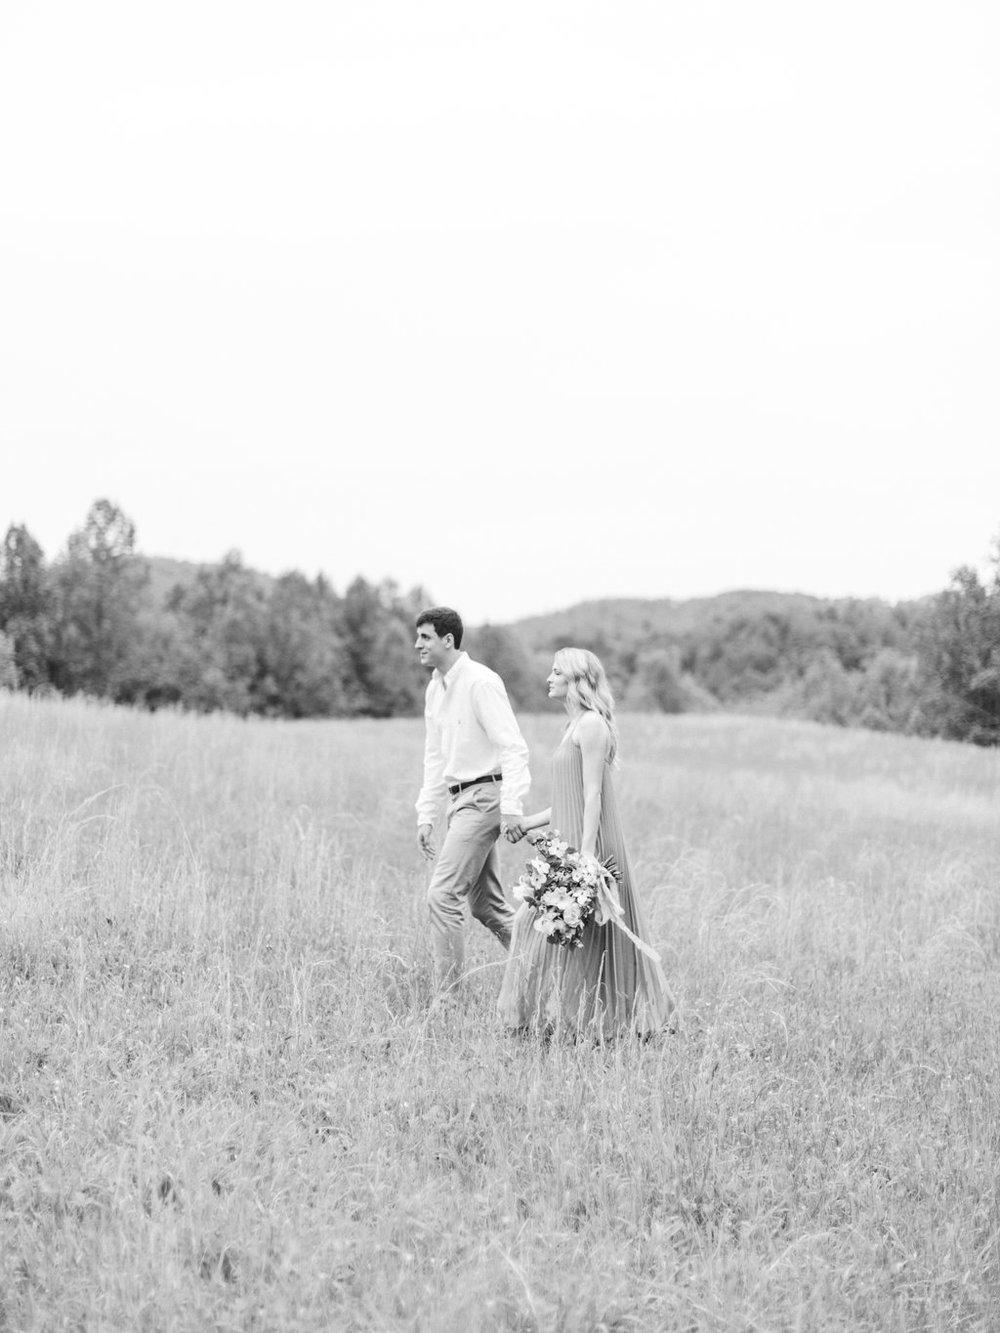 Rachel-May-Photography-5915-148.jpg